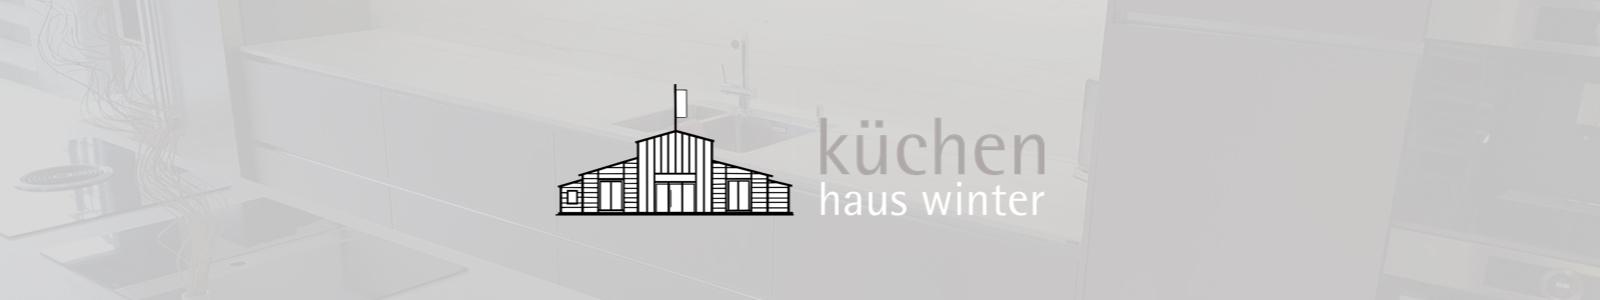 Kuchenstudio Kassel Kuchenstudio Bad Arolsen Kuchenstudio Baunatal